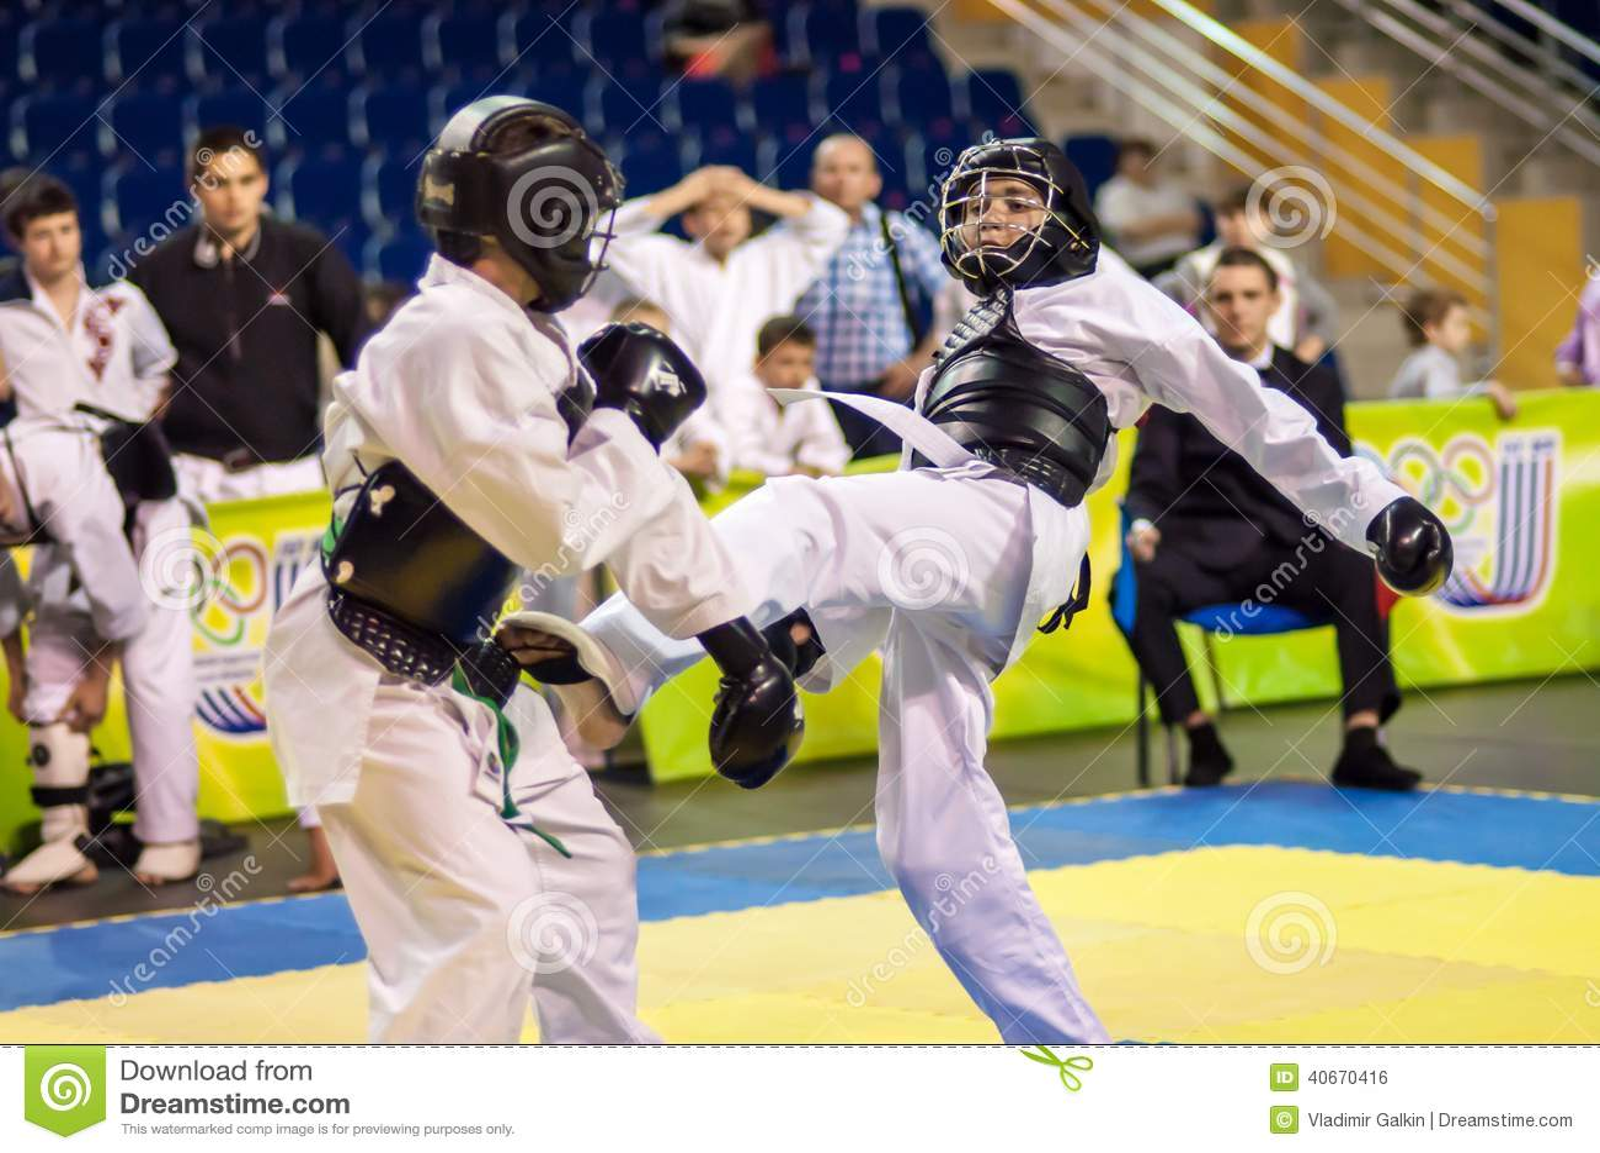 Kobudo competition between boys